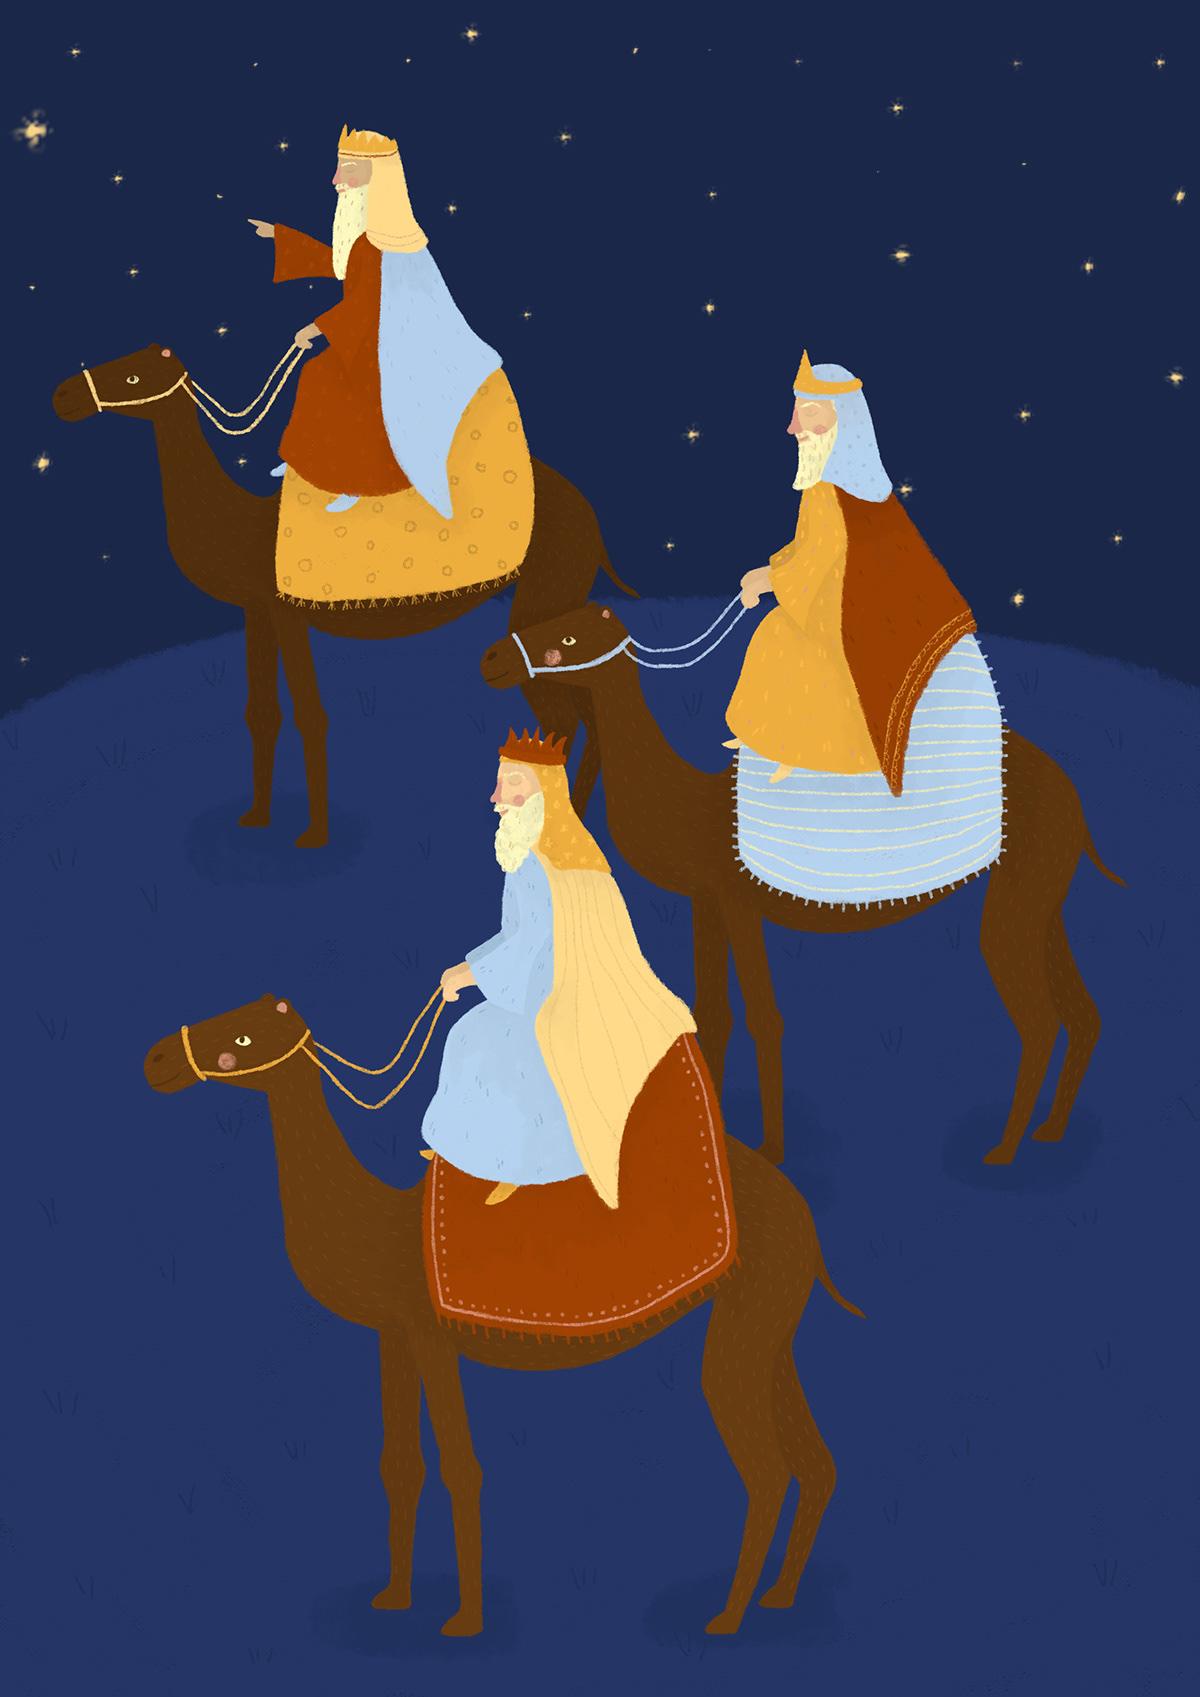 Christmas festive card design Greetings card christmas cards angel Wise Men stable nativity shephard